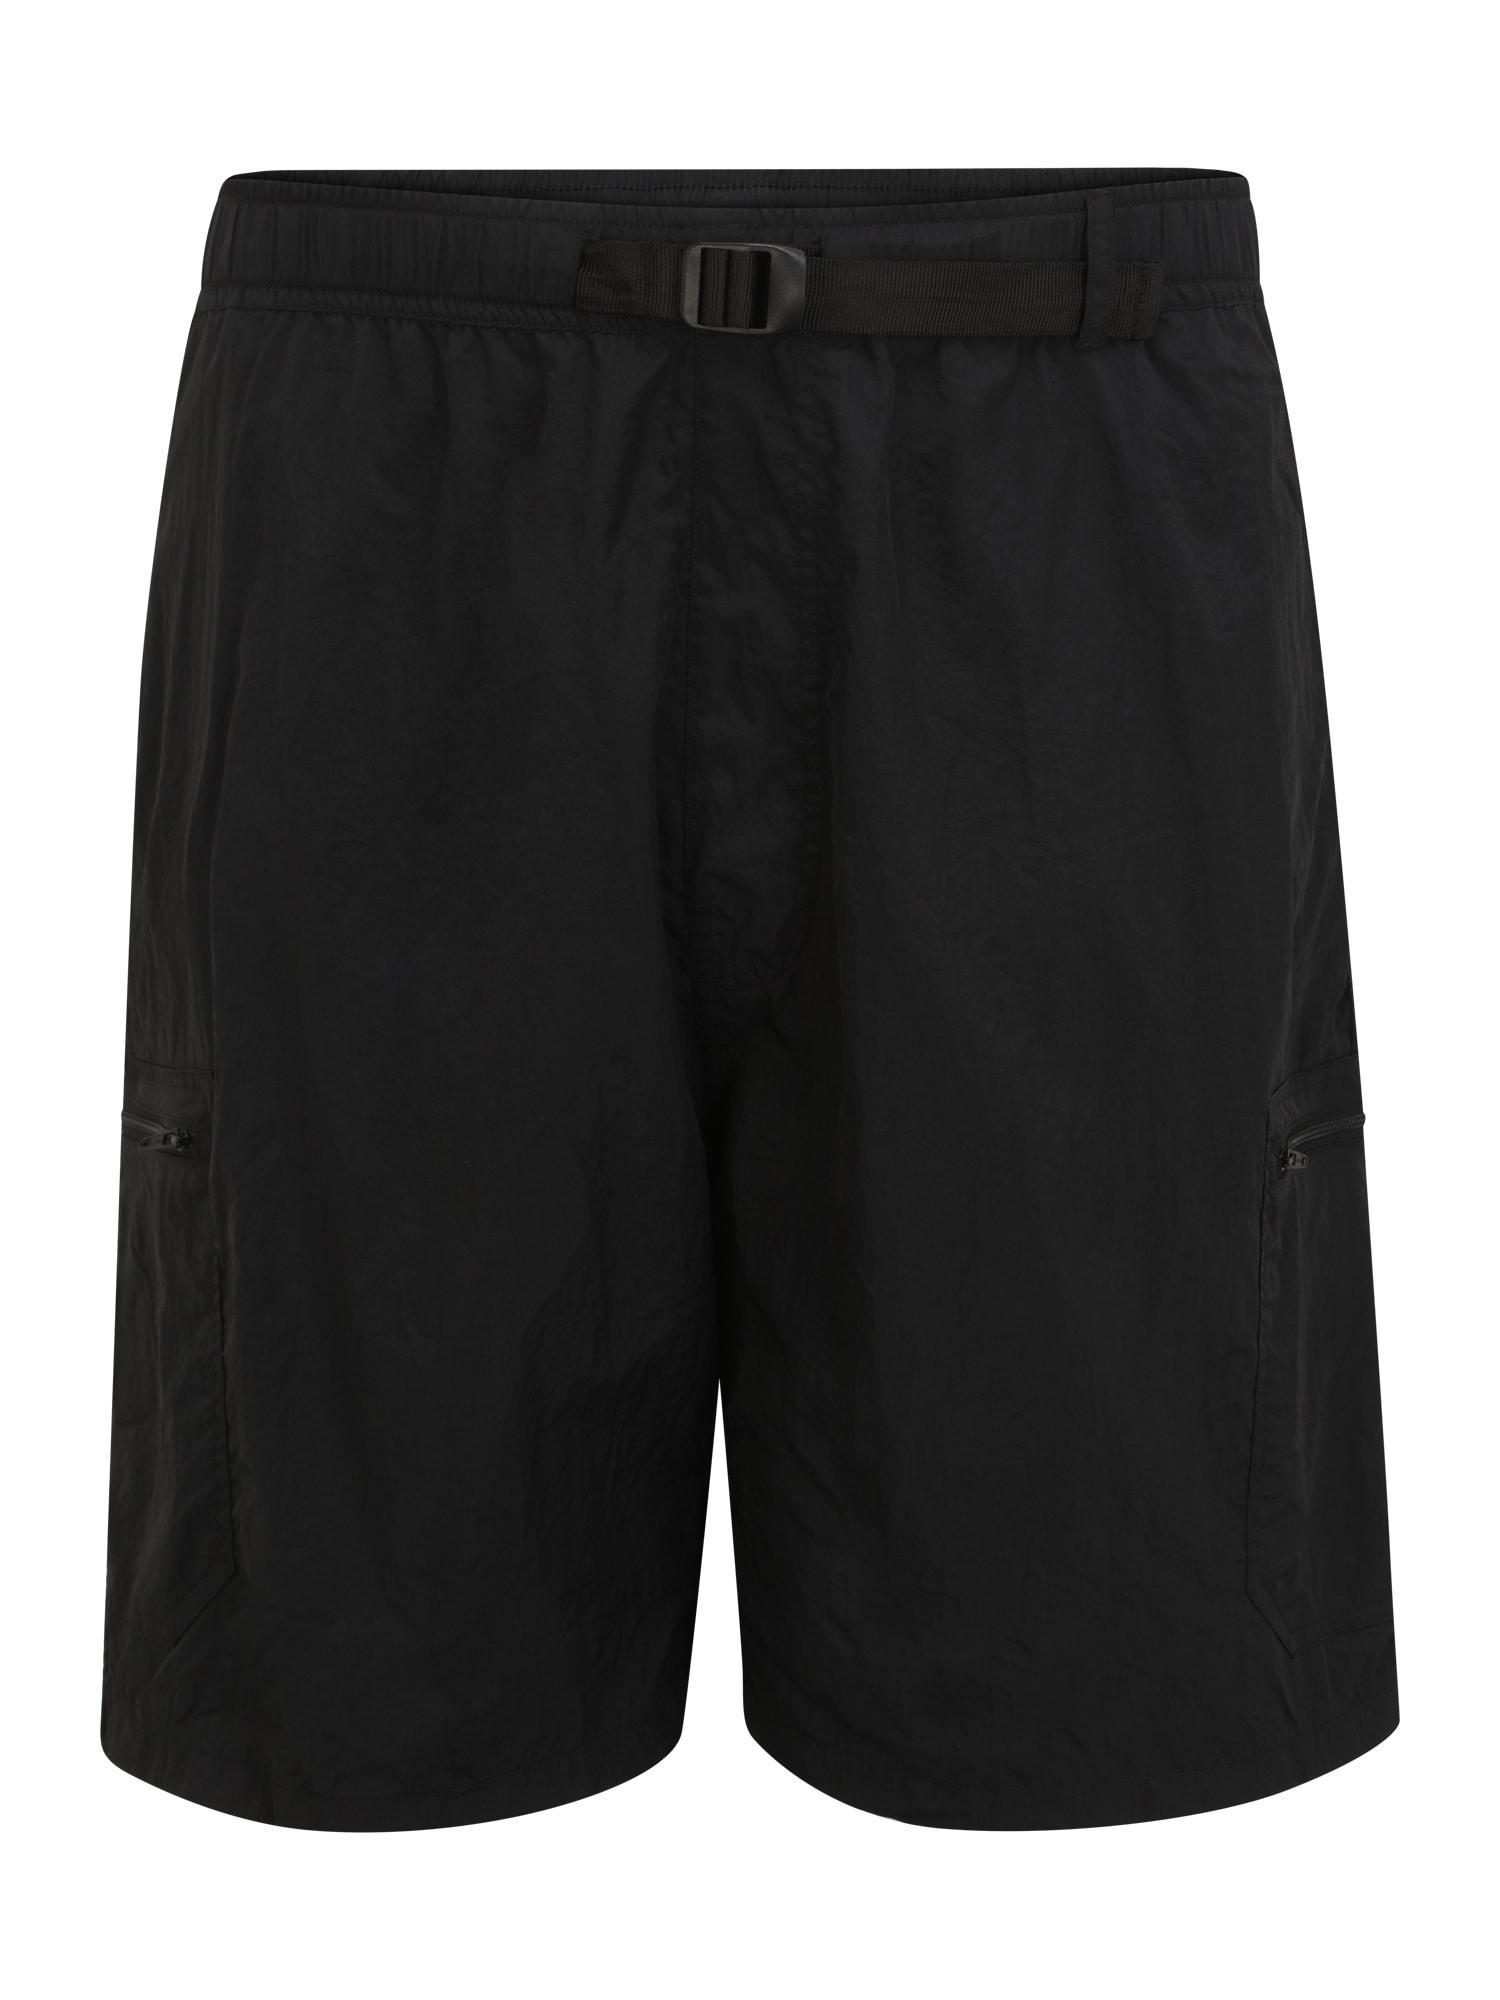 Urban Classics Plus Size Laisvo stiliaus kelnės juoda